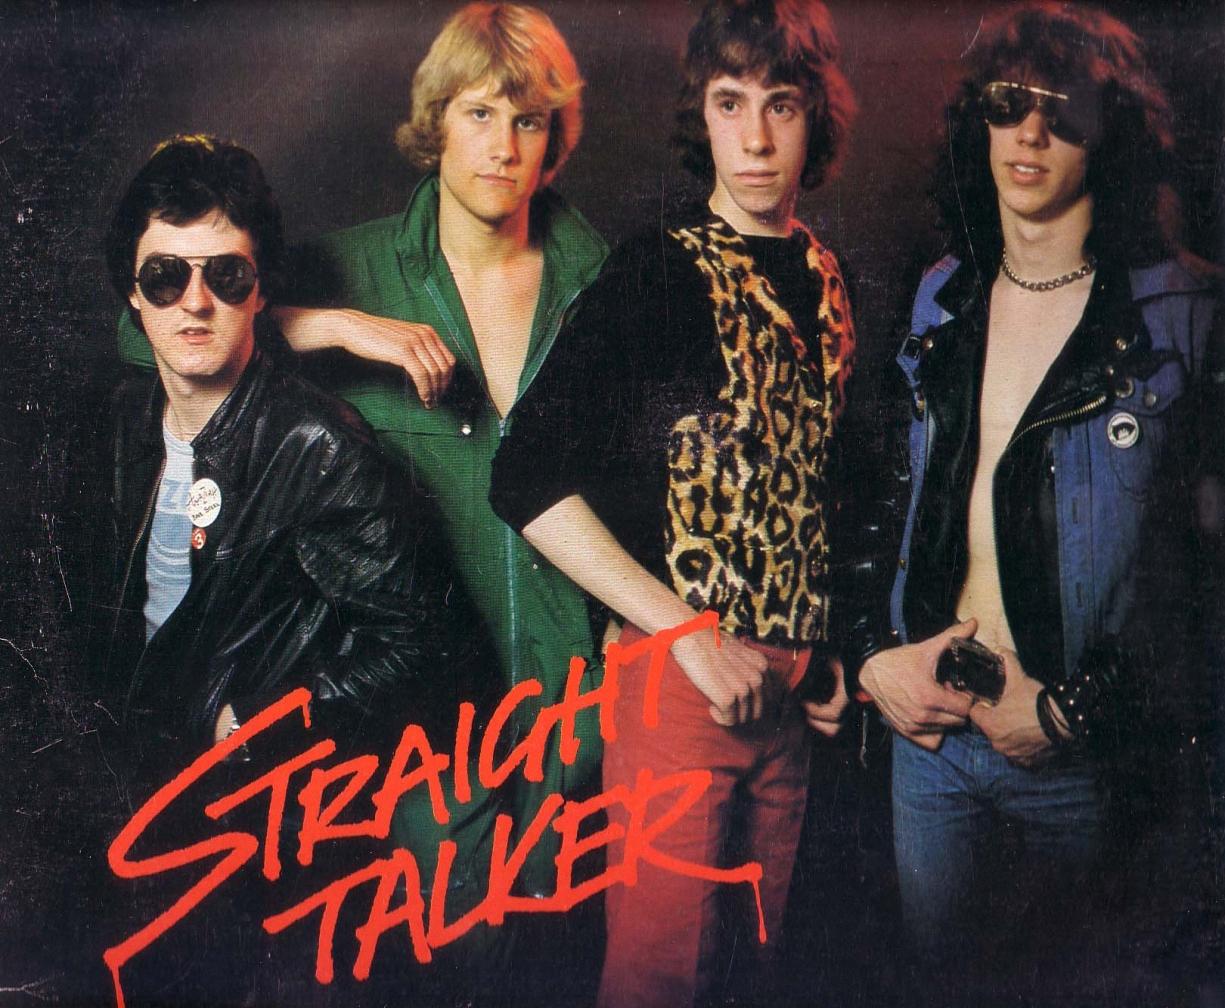 Amaziah - Straight Talker 1979/2012